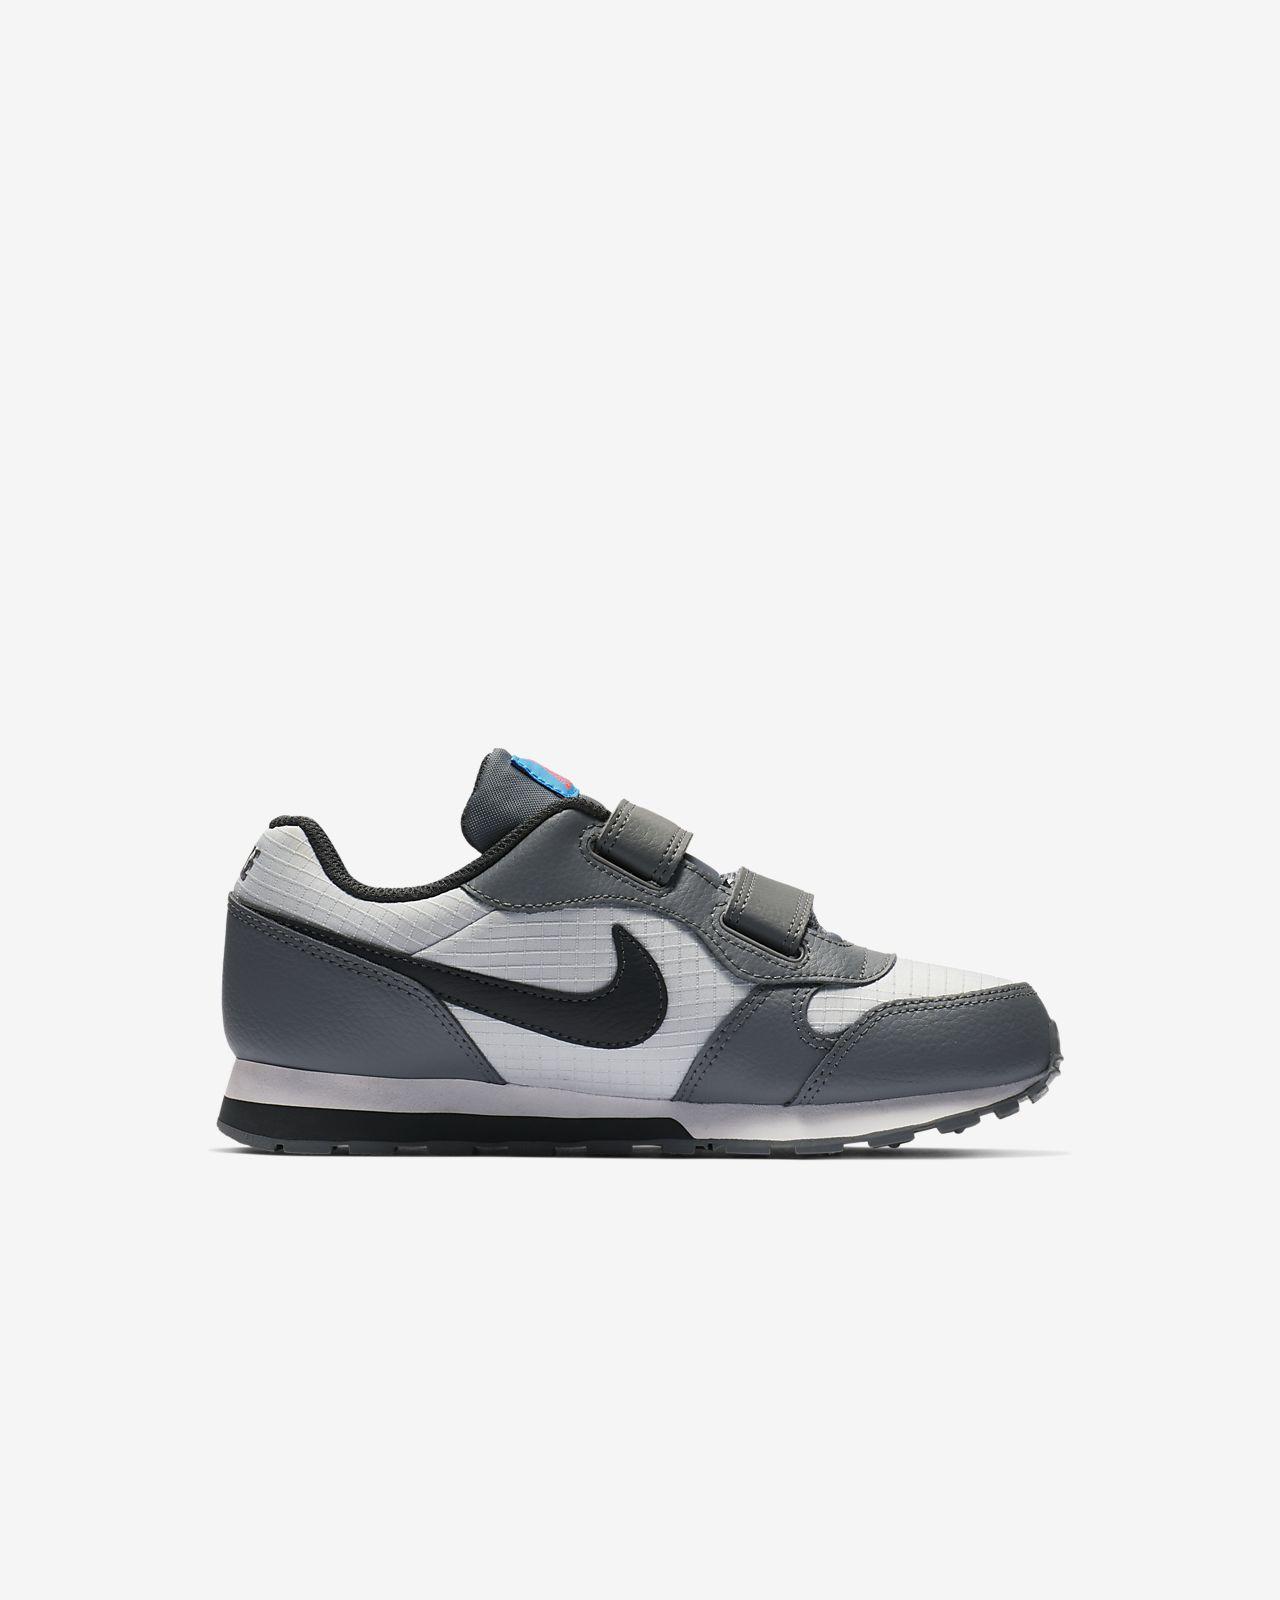 3d680173f Calzado para niños talla pequeña Nike MD Runner 2. Nike.com MX